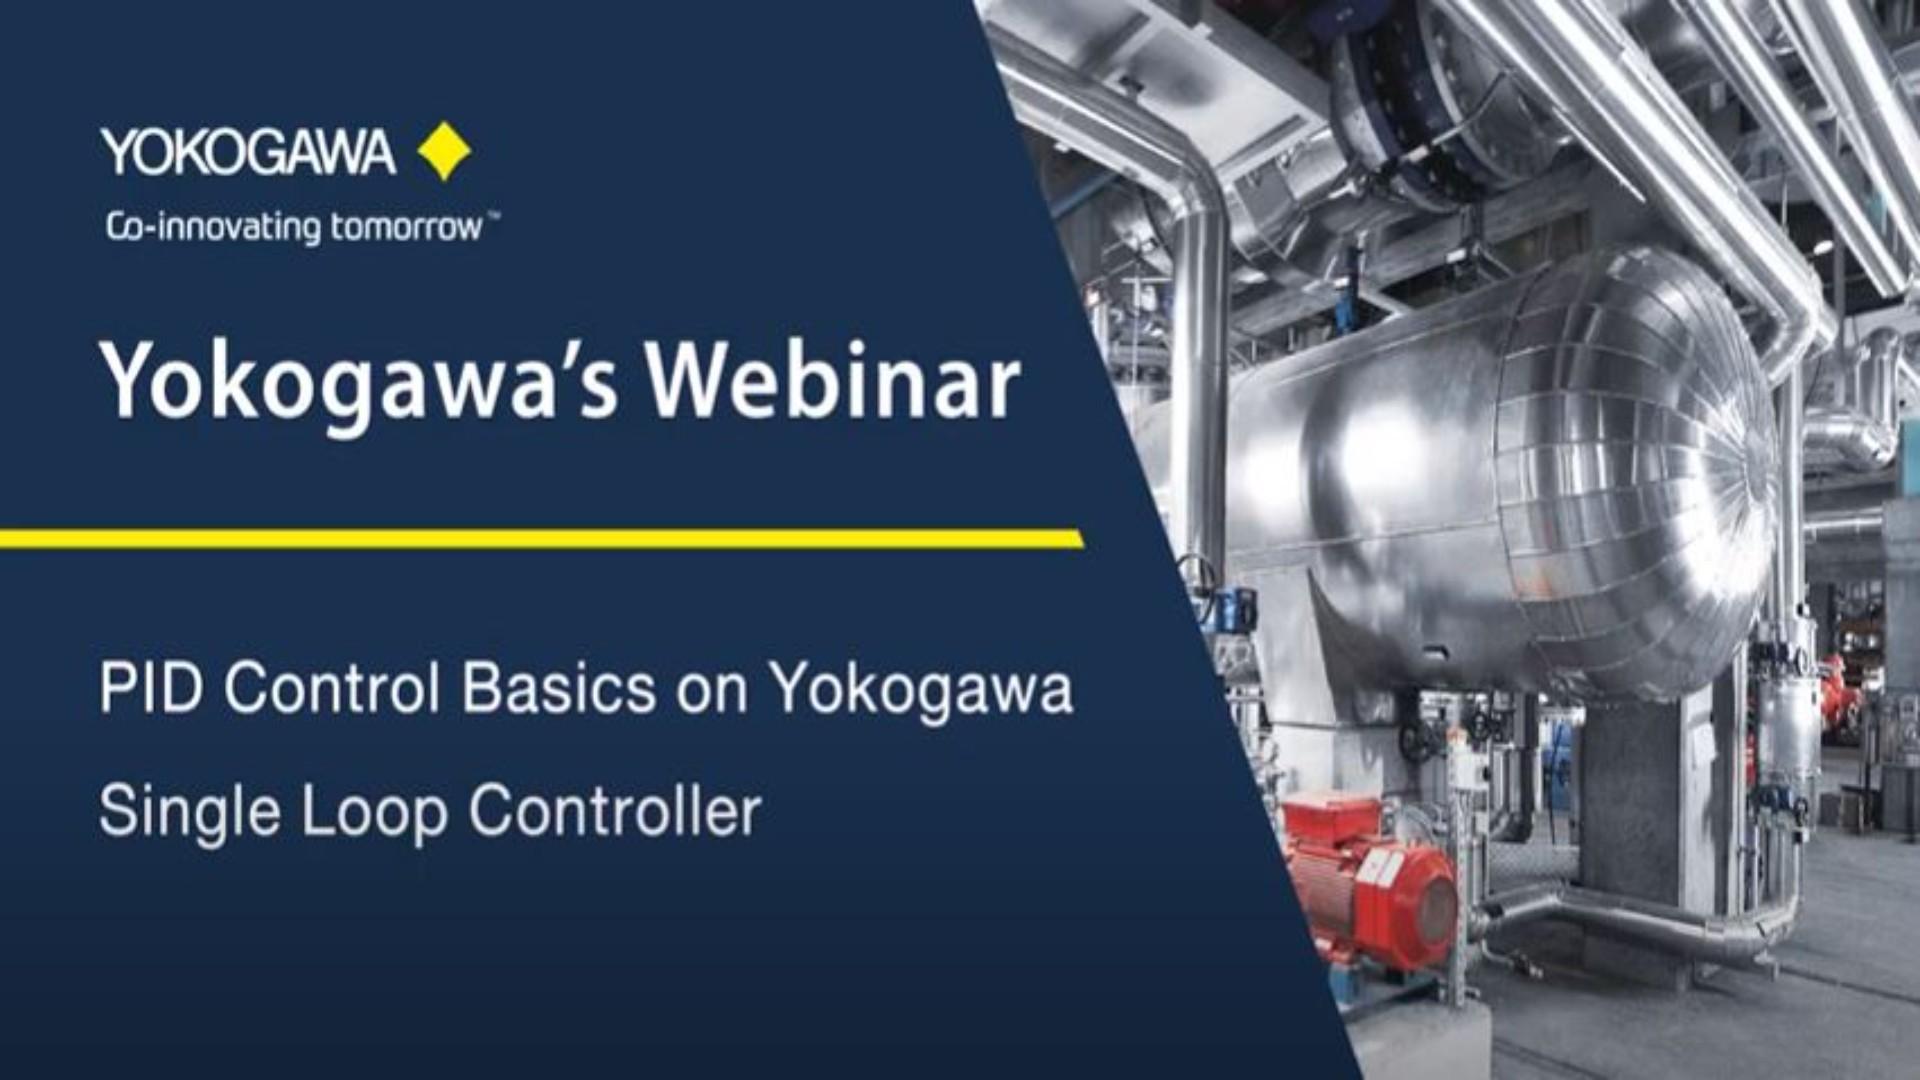 Yokogawa's Webinar PID Control Basics on Yokogawa Single Loop Controller